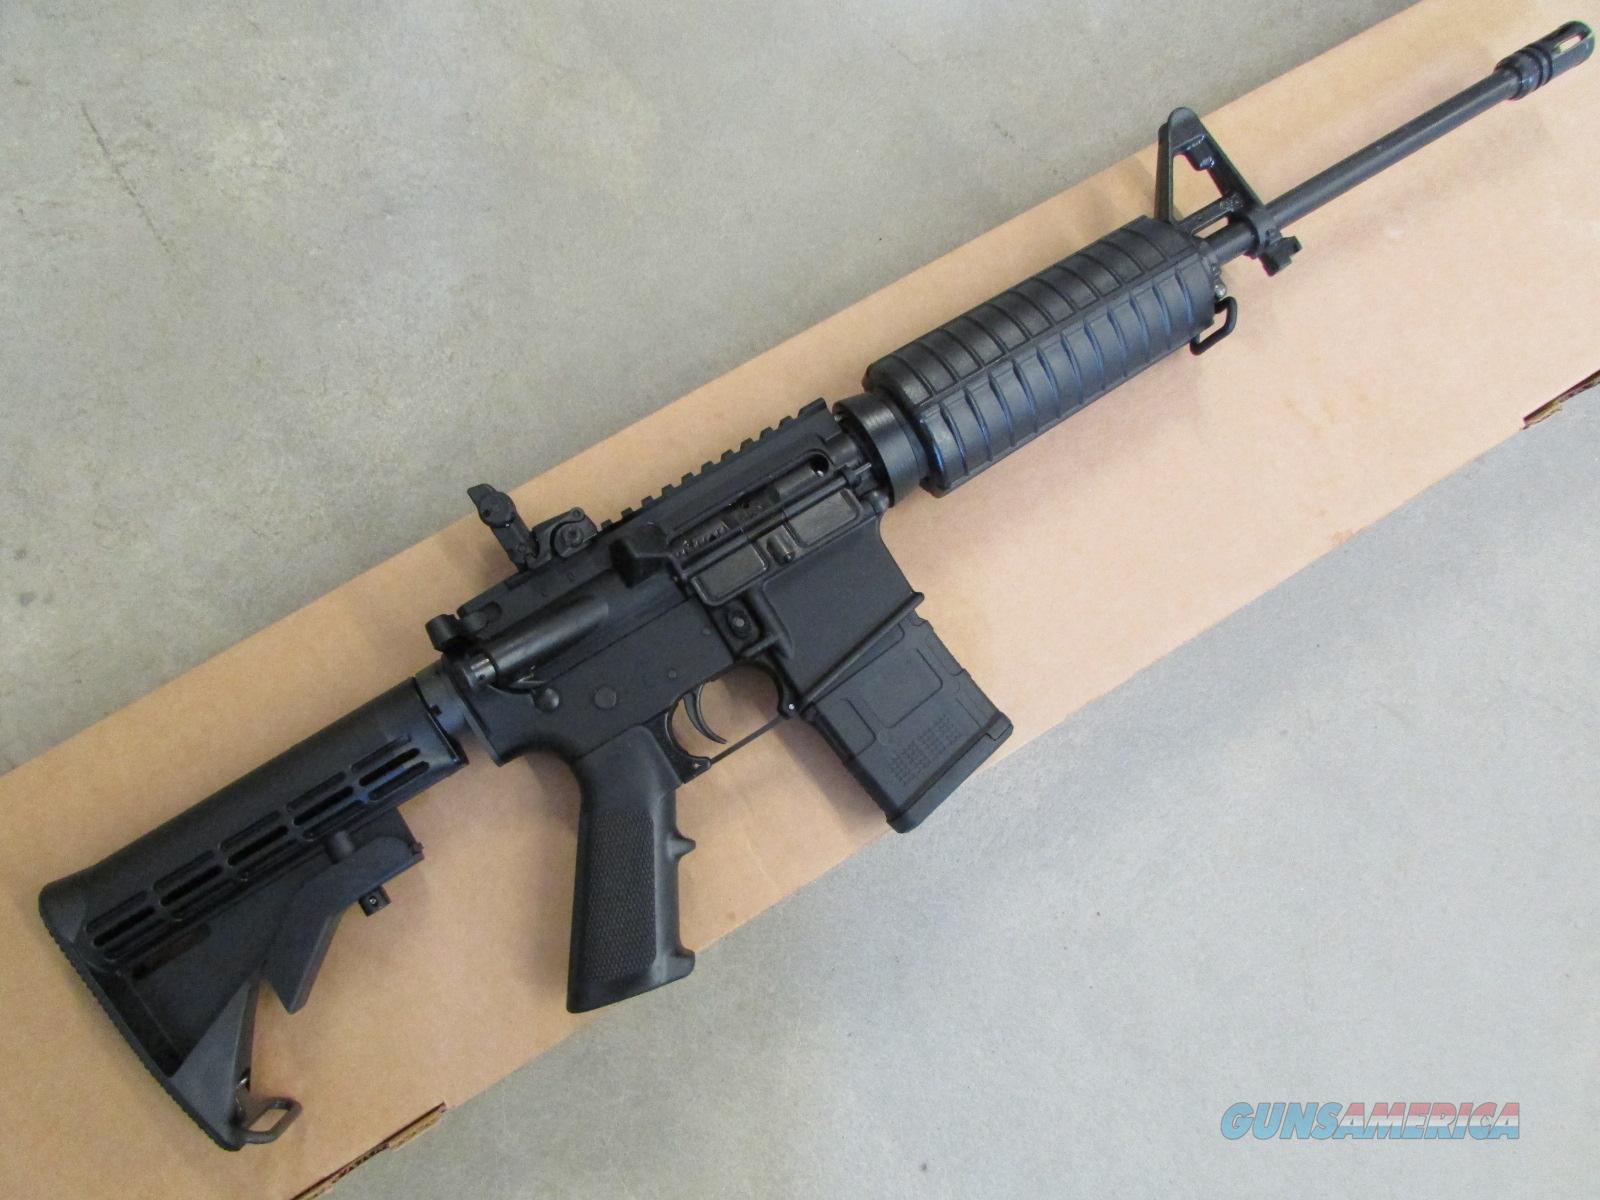 223 Carbine For Sale 223 Remington 556 Caliber Rifles For Sale